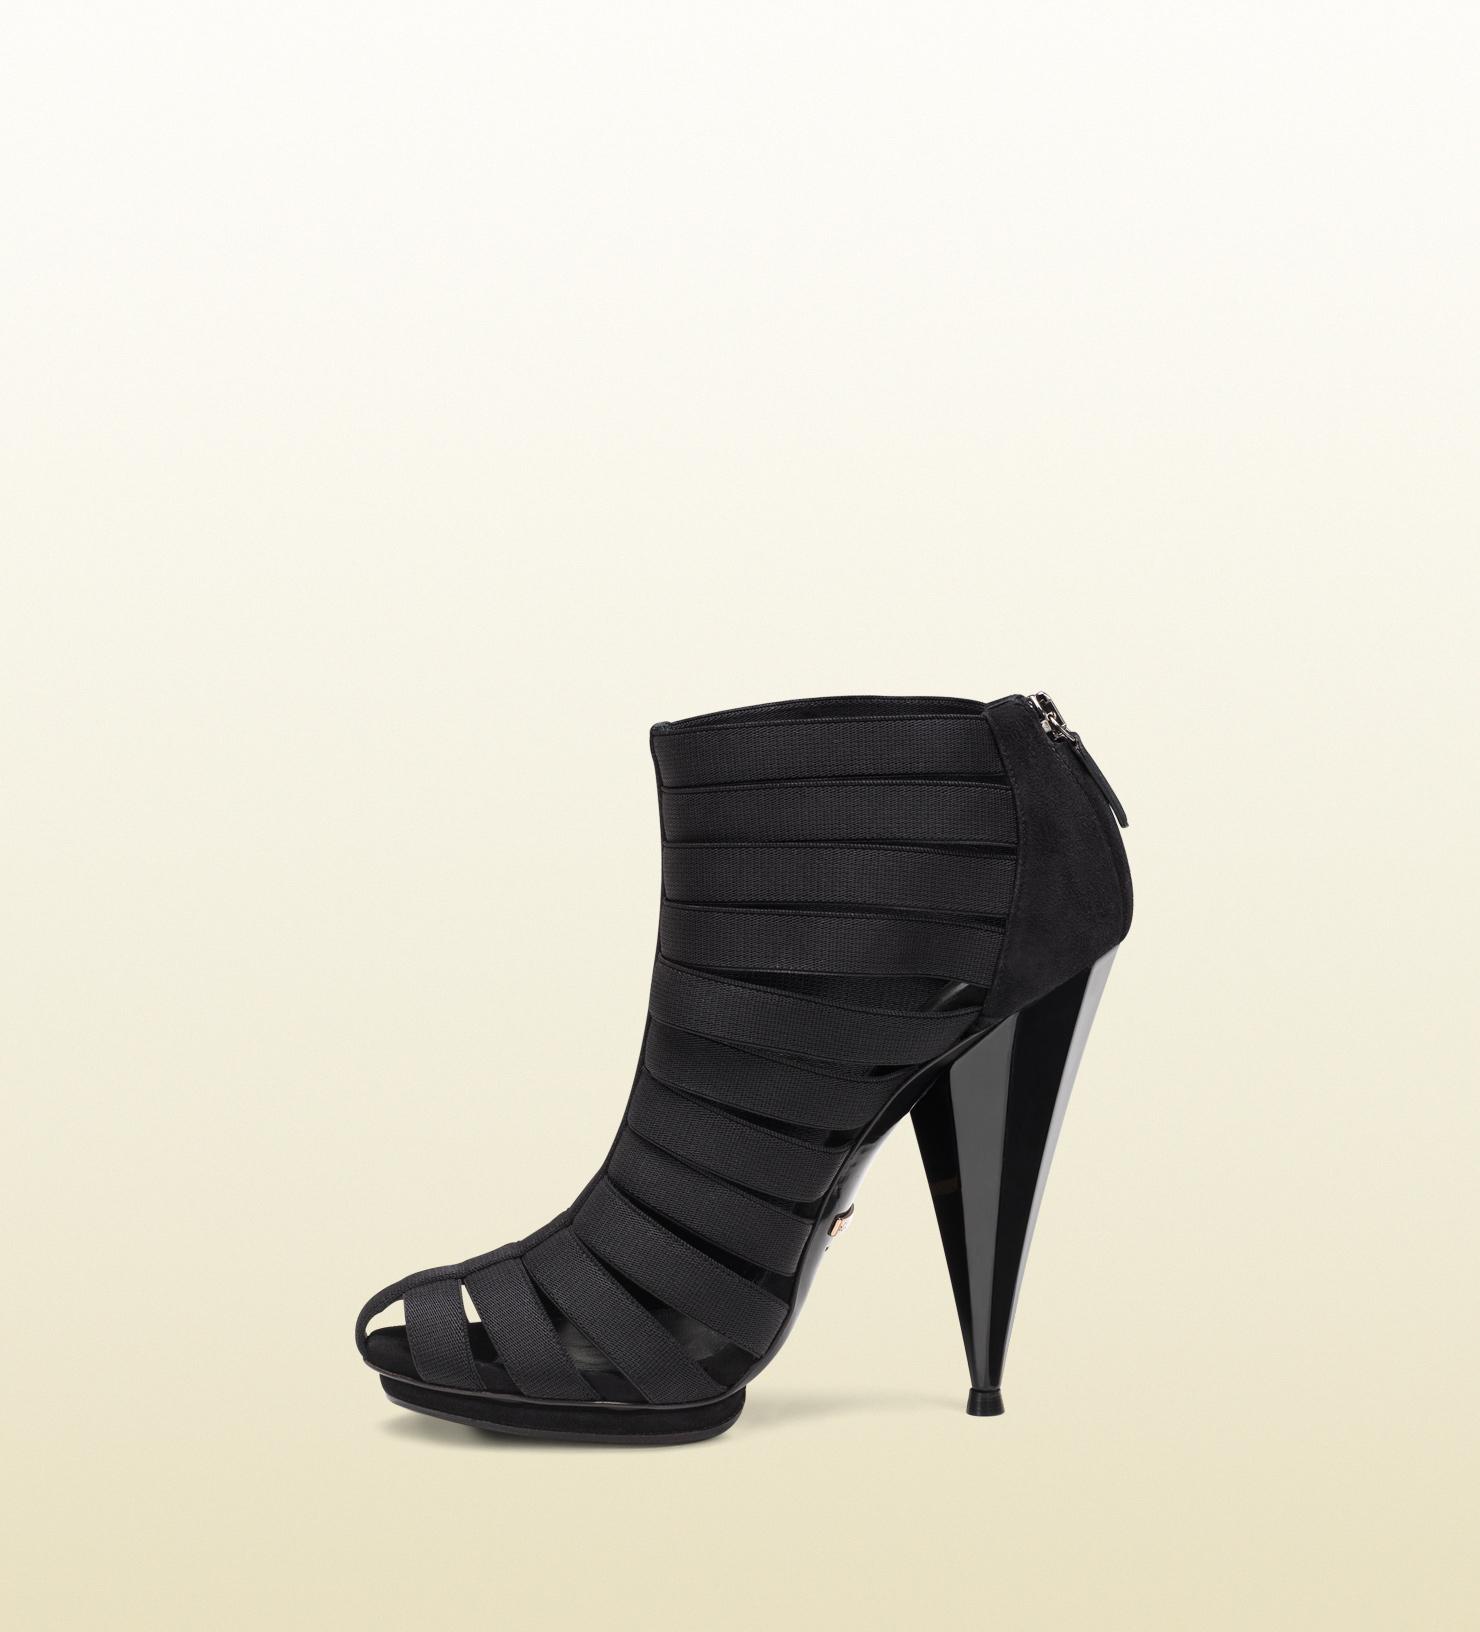 1dc89b3c1 Gucci Isadora Elastic Gladiator Bootie in Black - Lyst